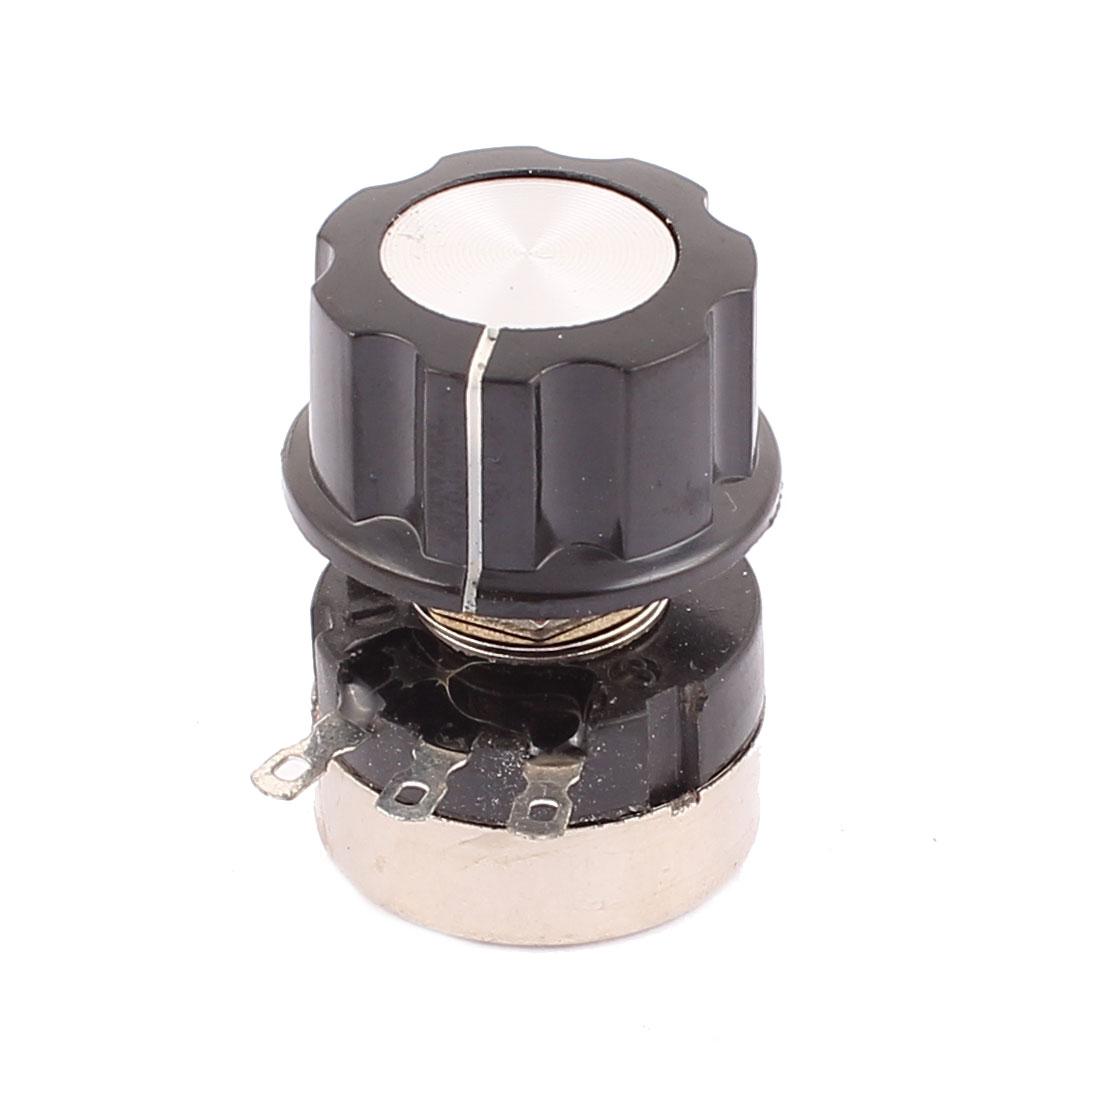 3 Terminals B204 Rotary Wirewound Potentiometer 200K Ohm Adjustable Resistance